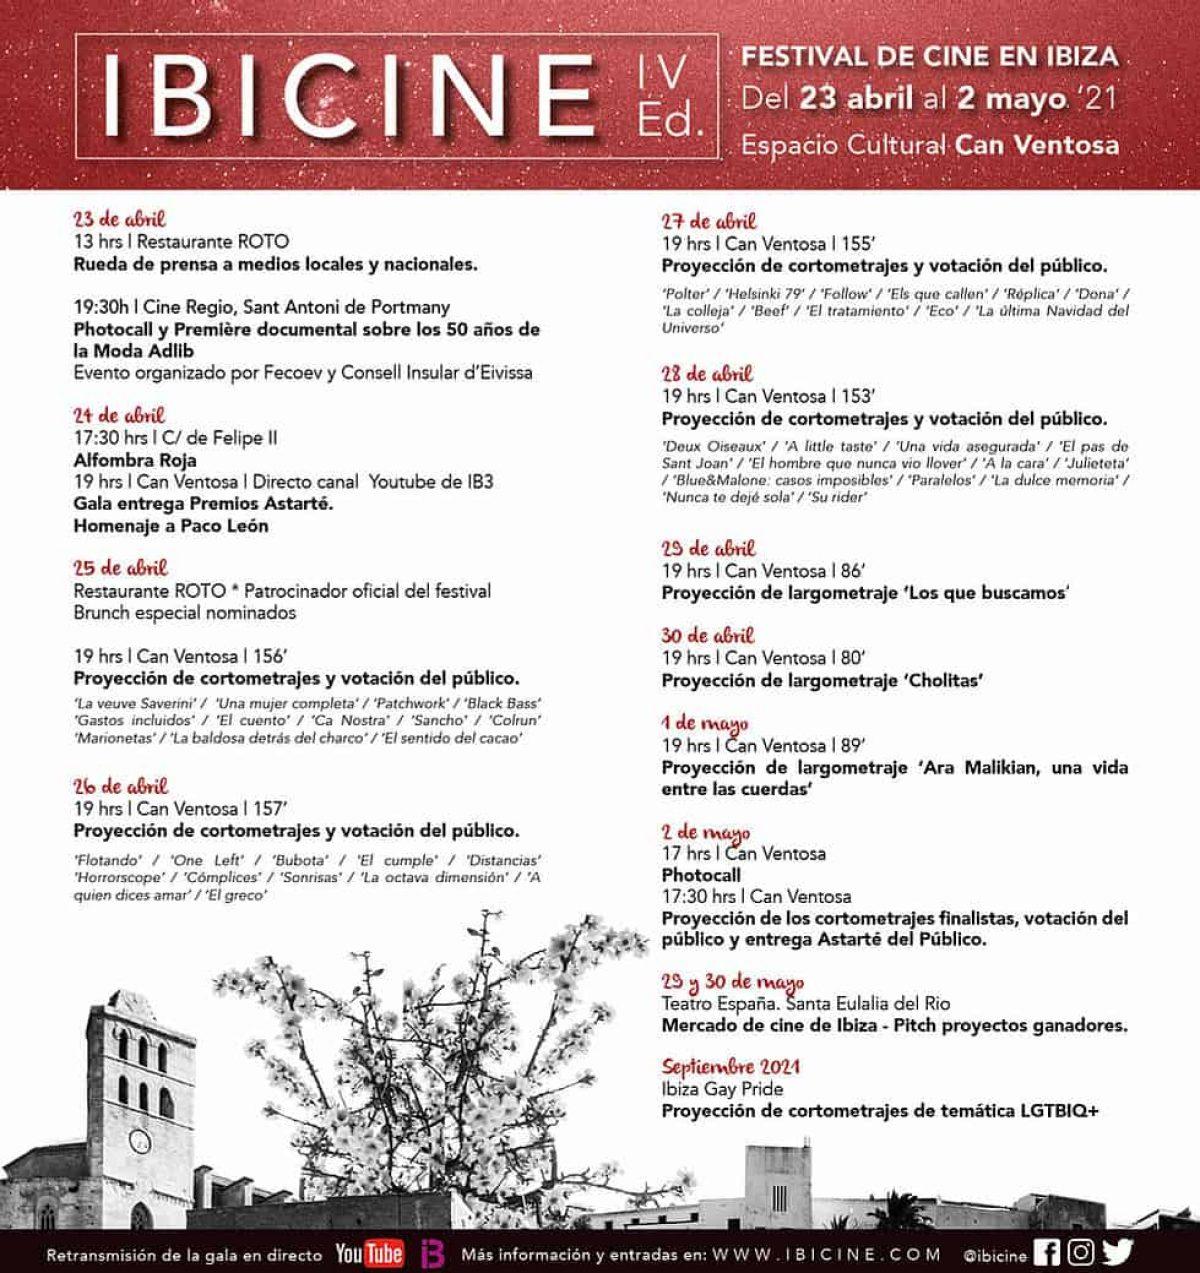 ibicine festival Eivissa 2021